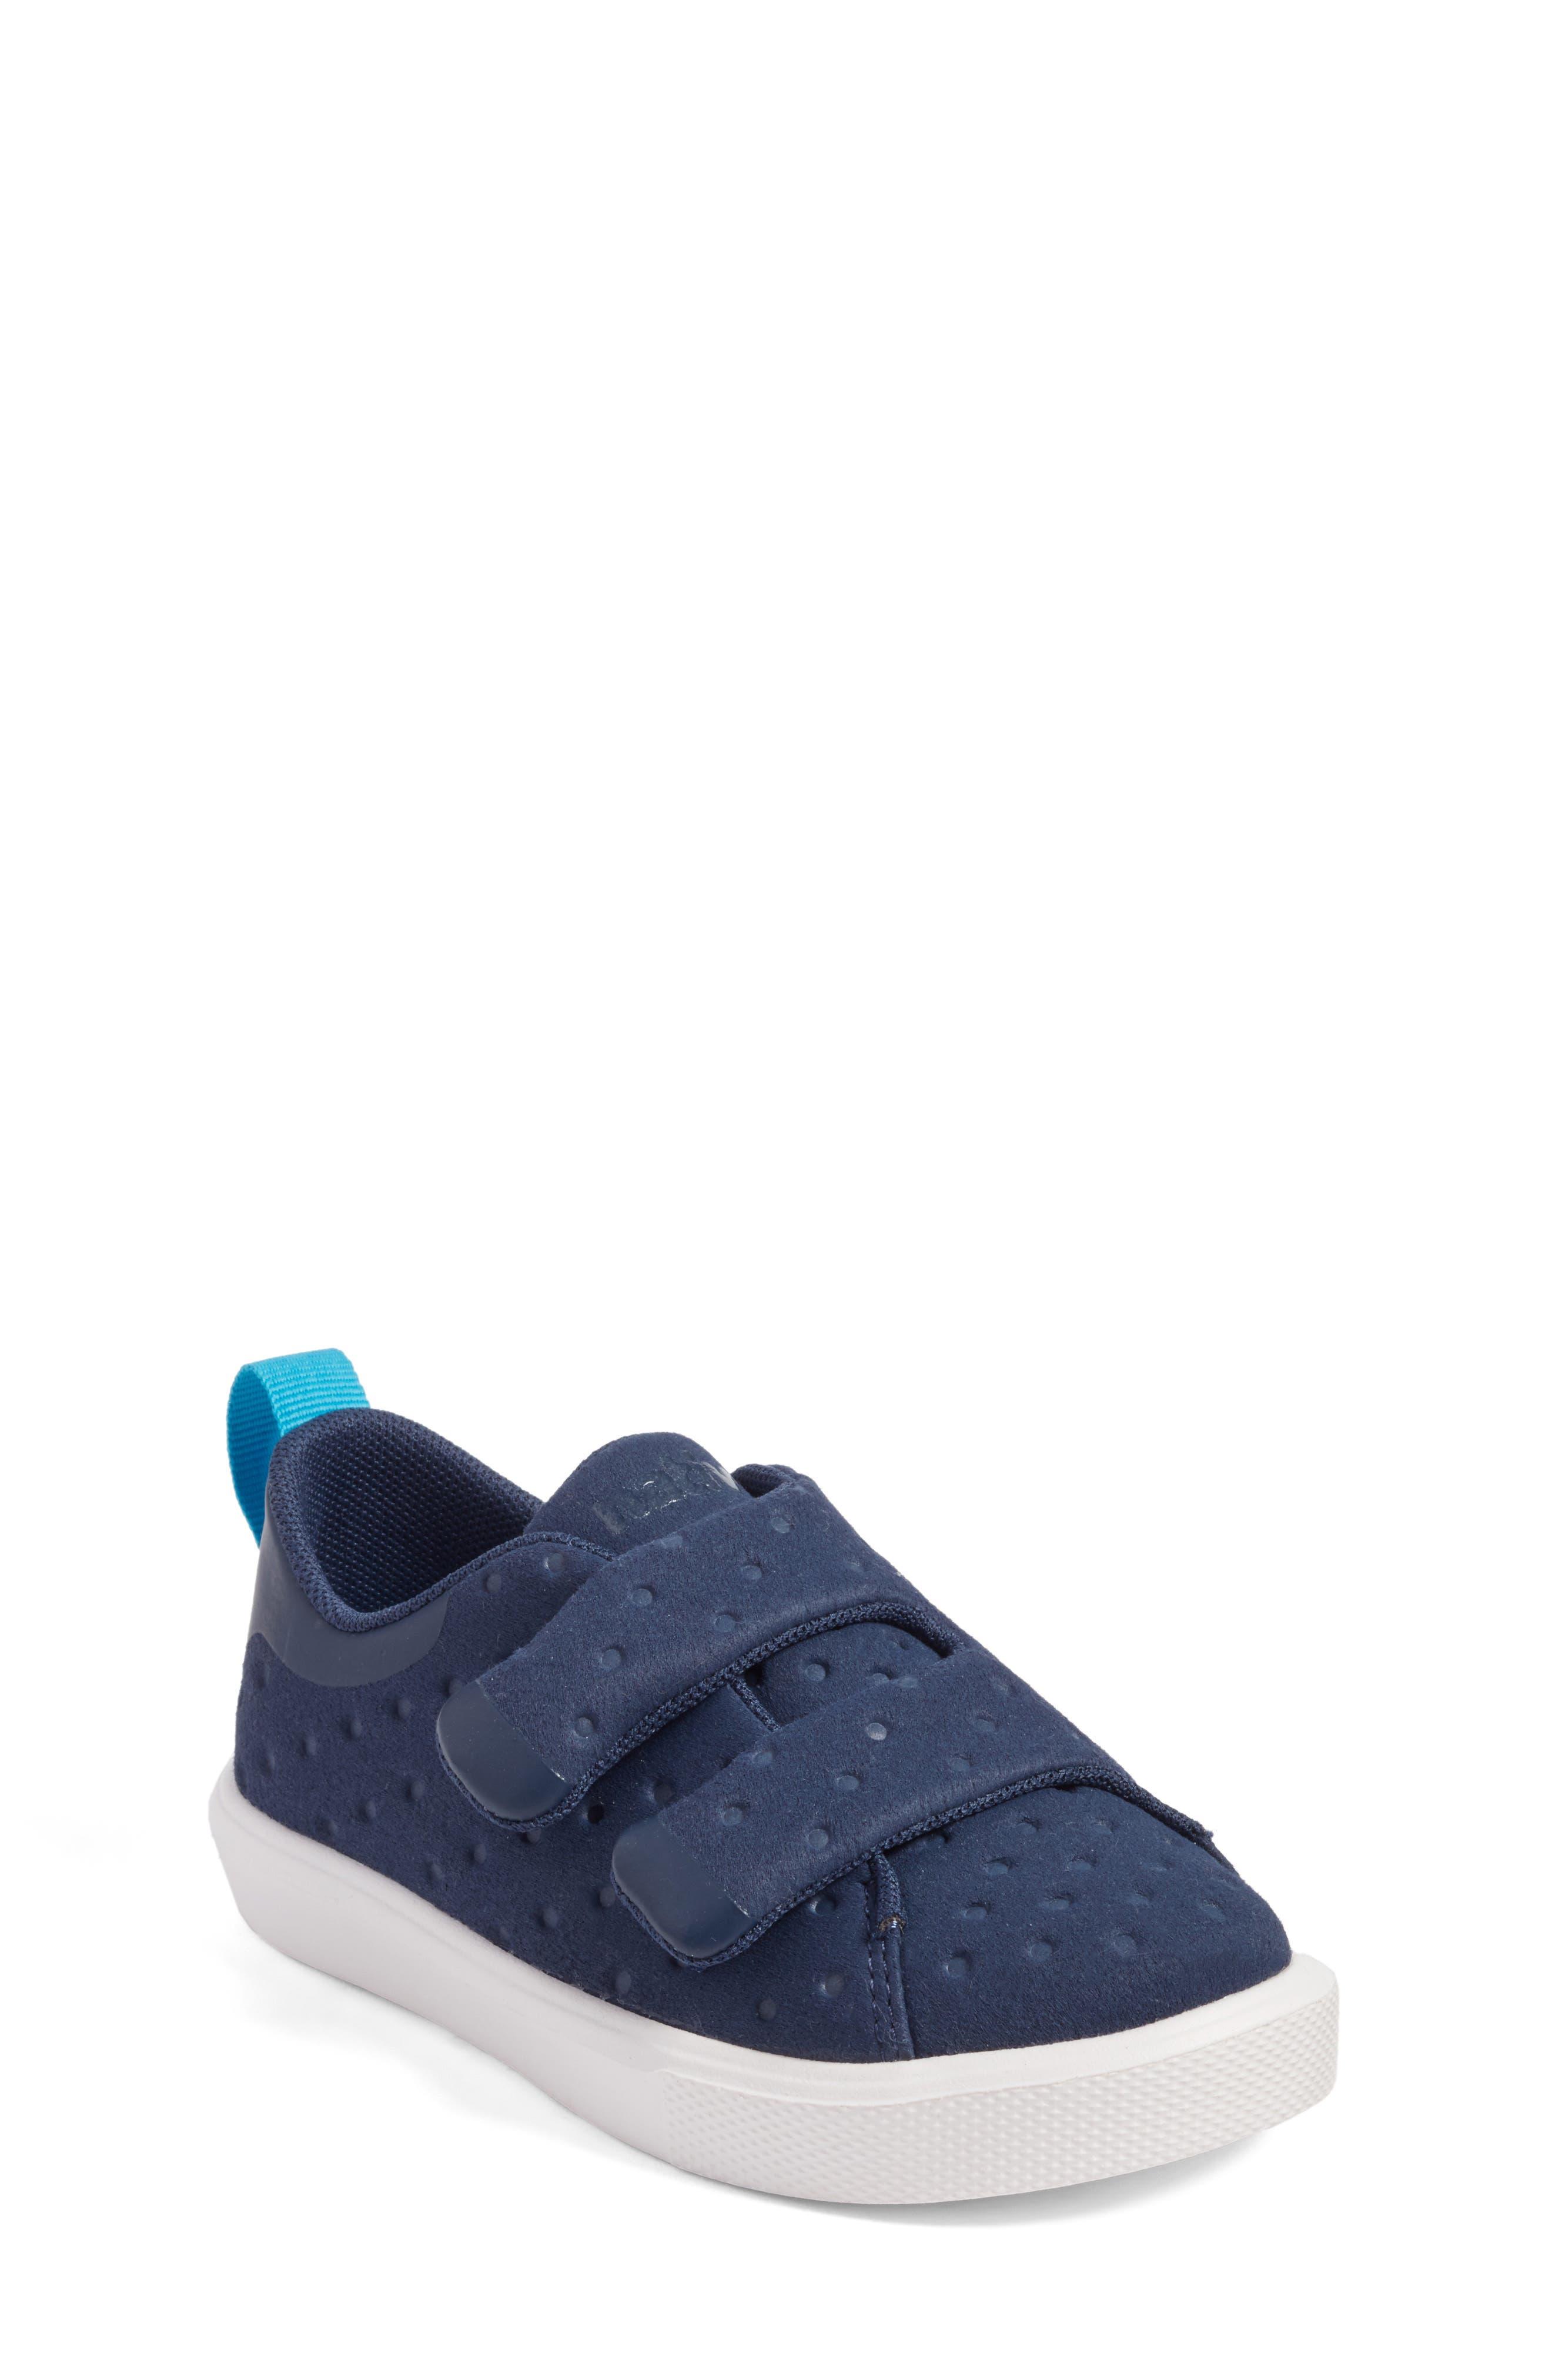 Monaco Sneaker,                             Main thumbnail 1, color,                             REGATTA BLUE/ SHELL WHITE